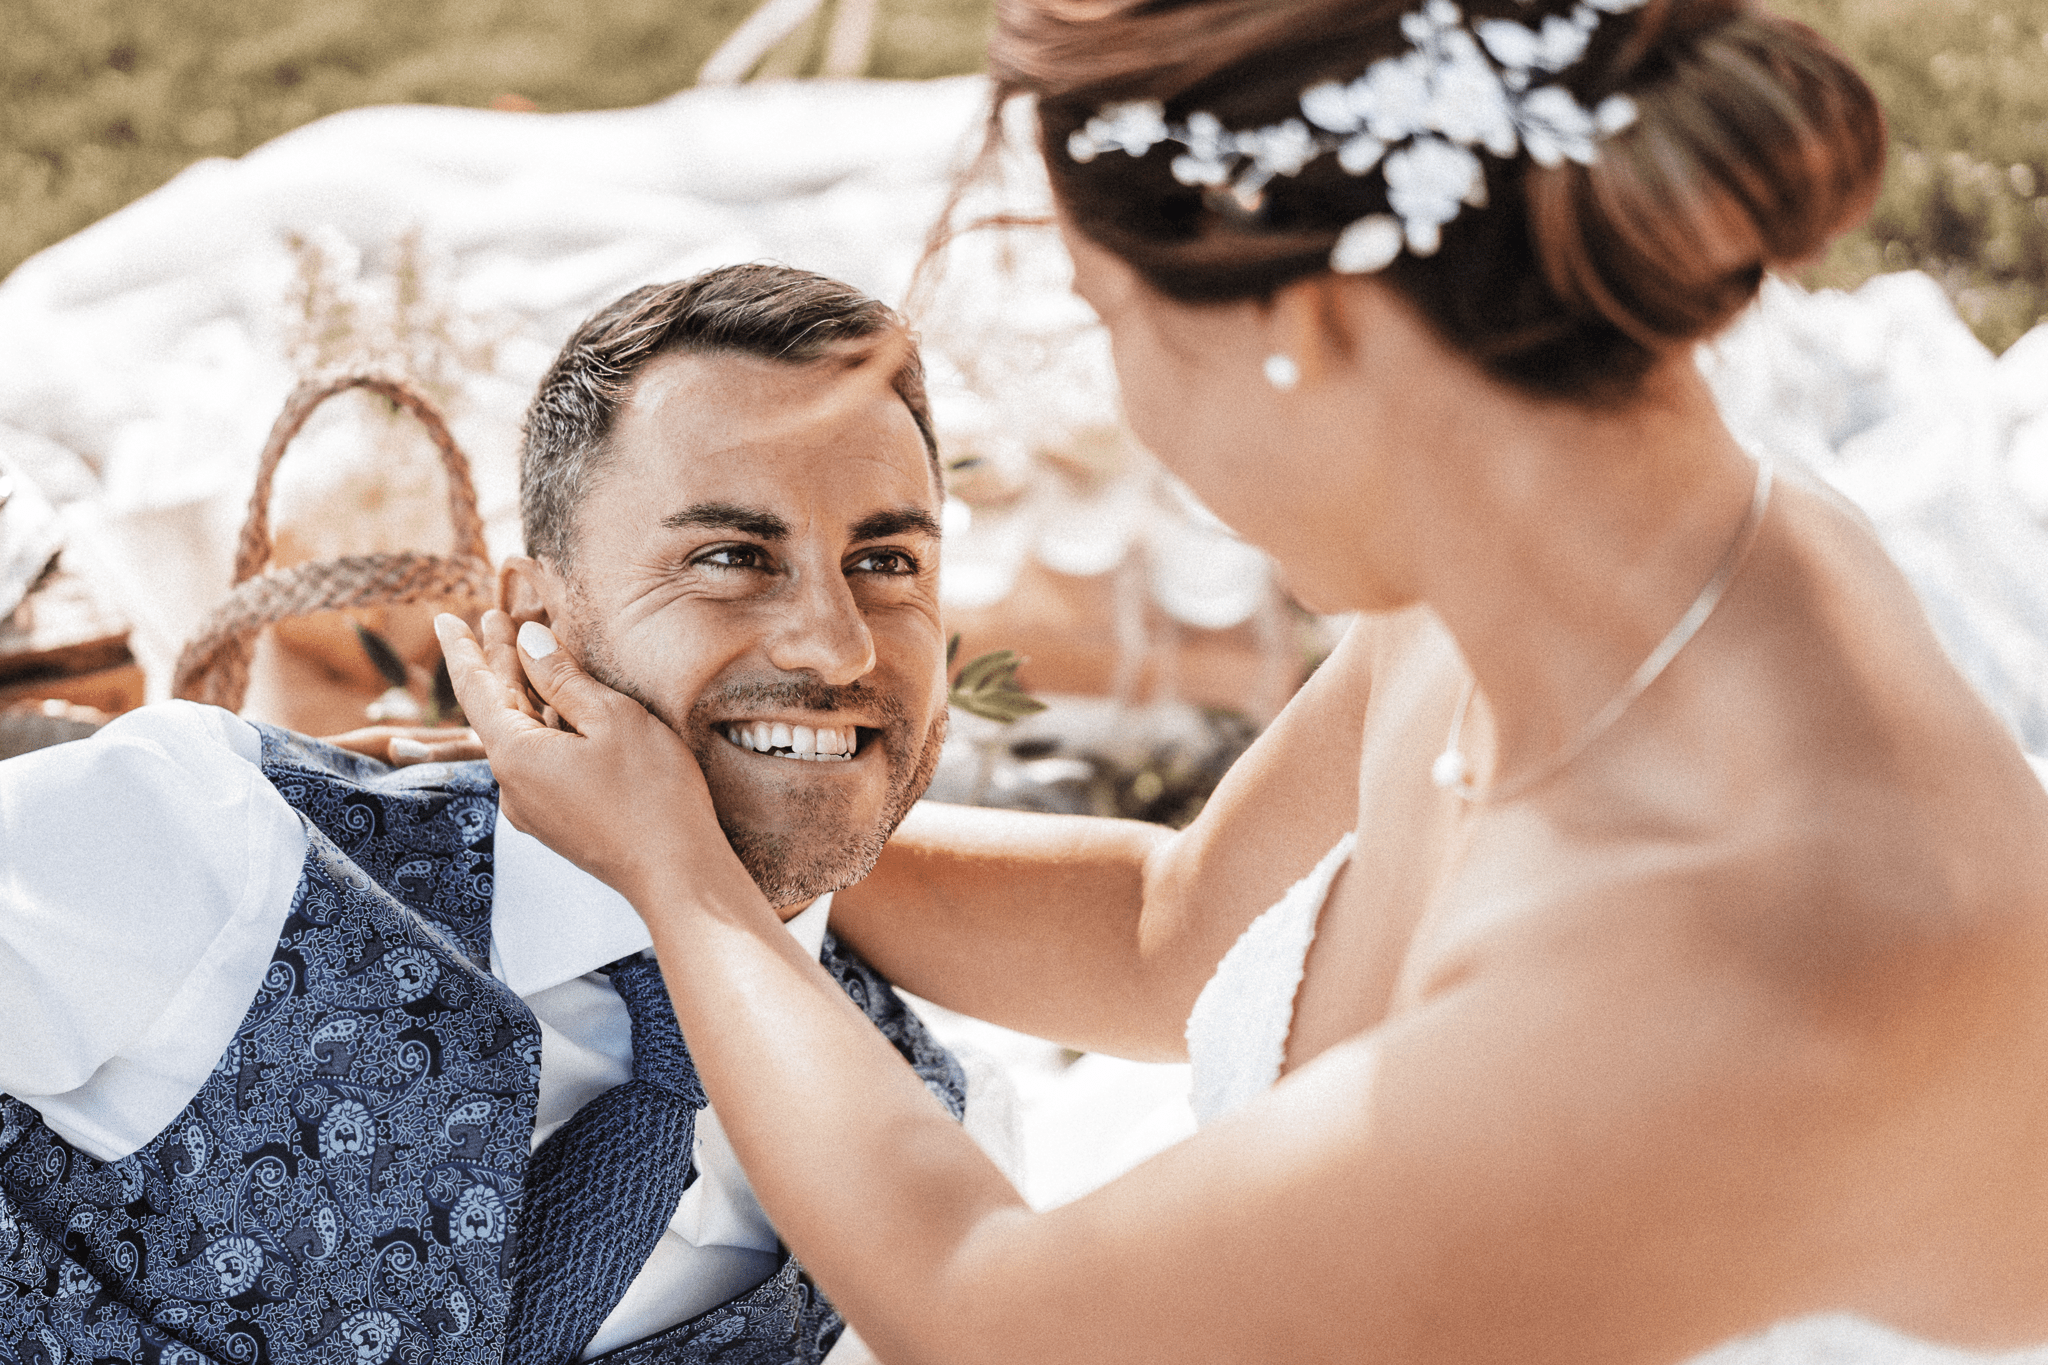 brautatelier-ried-styled shooting-fellnerhof-eva und florian-couple shot-liegend-details-5-min